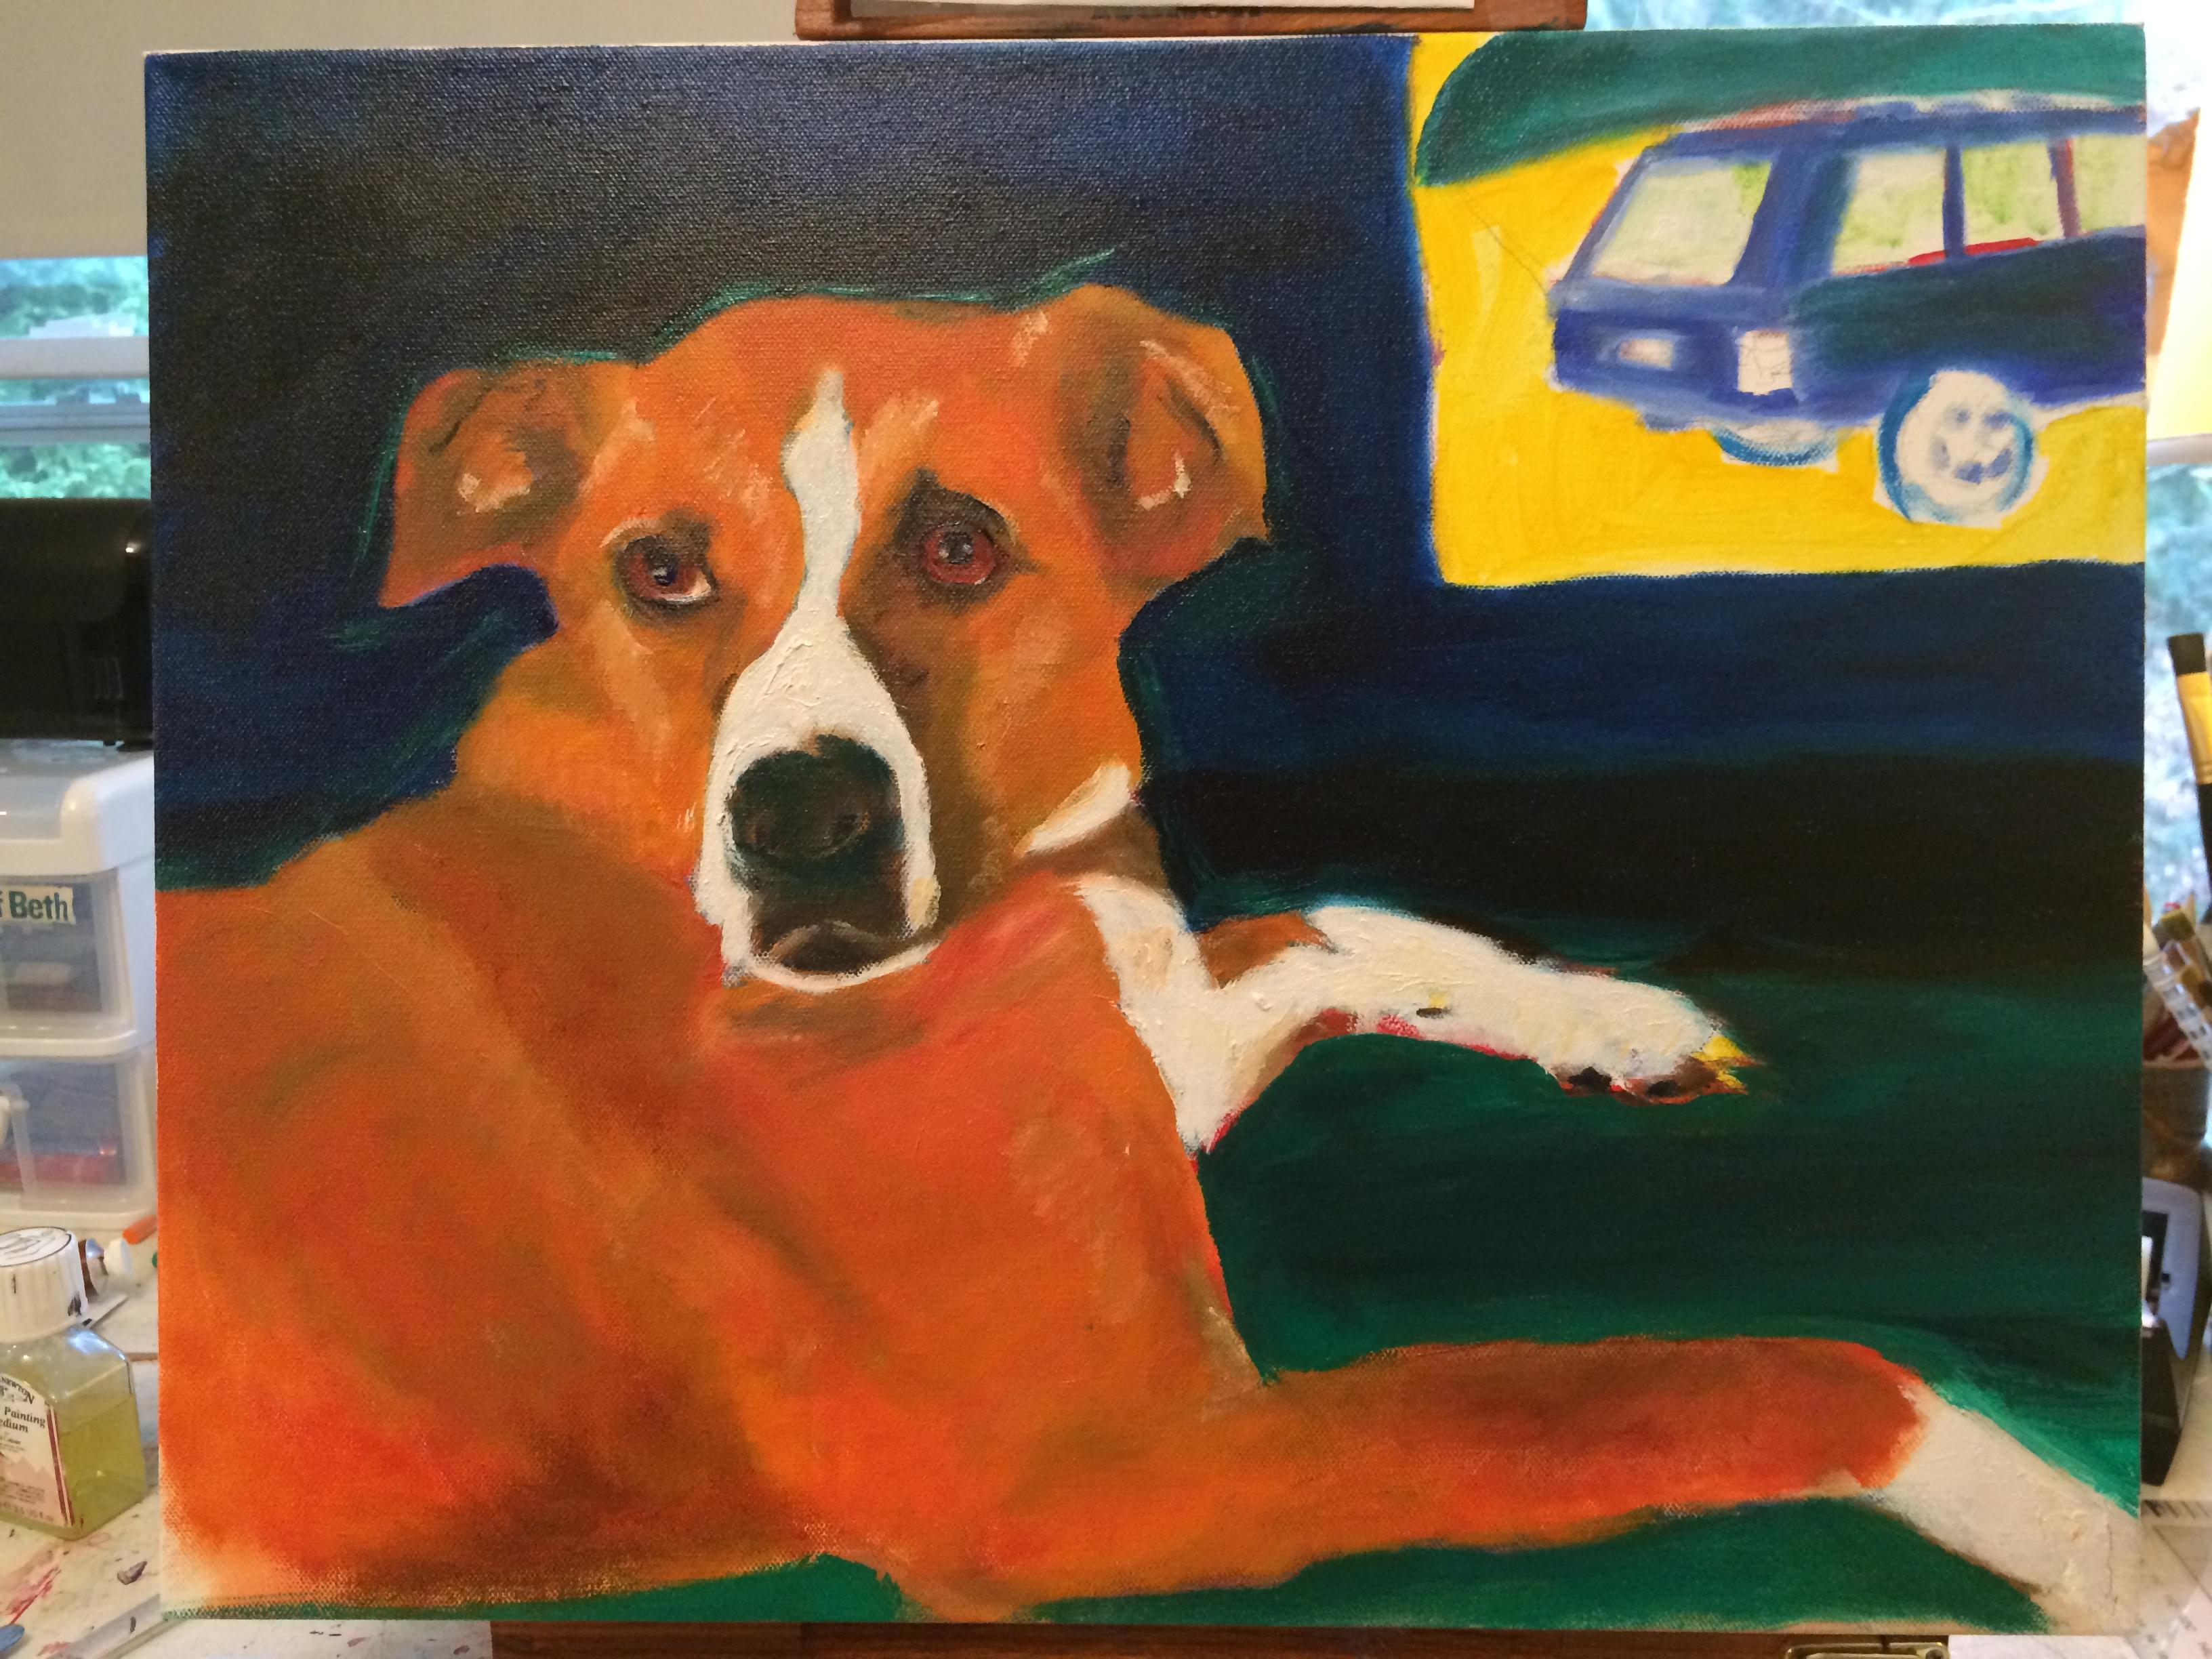 Hmmm, a dog and a car?